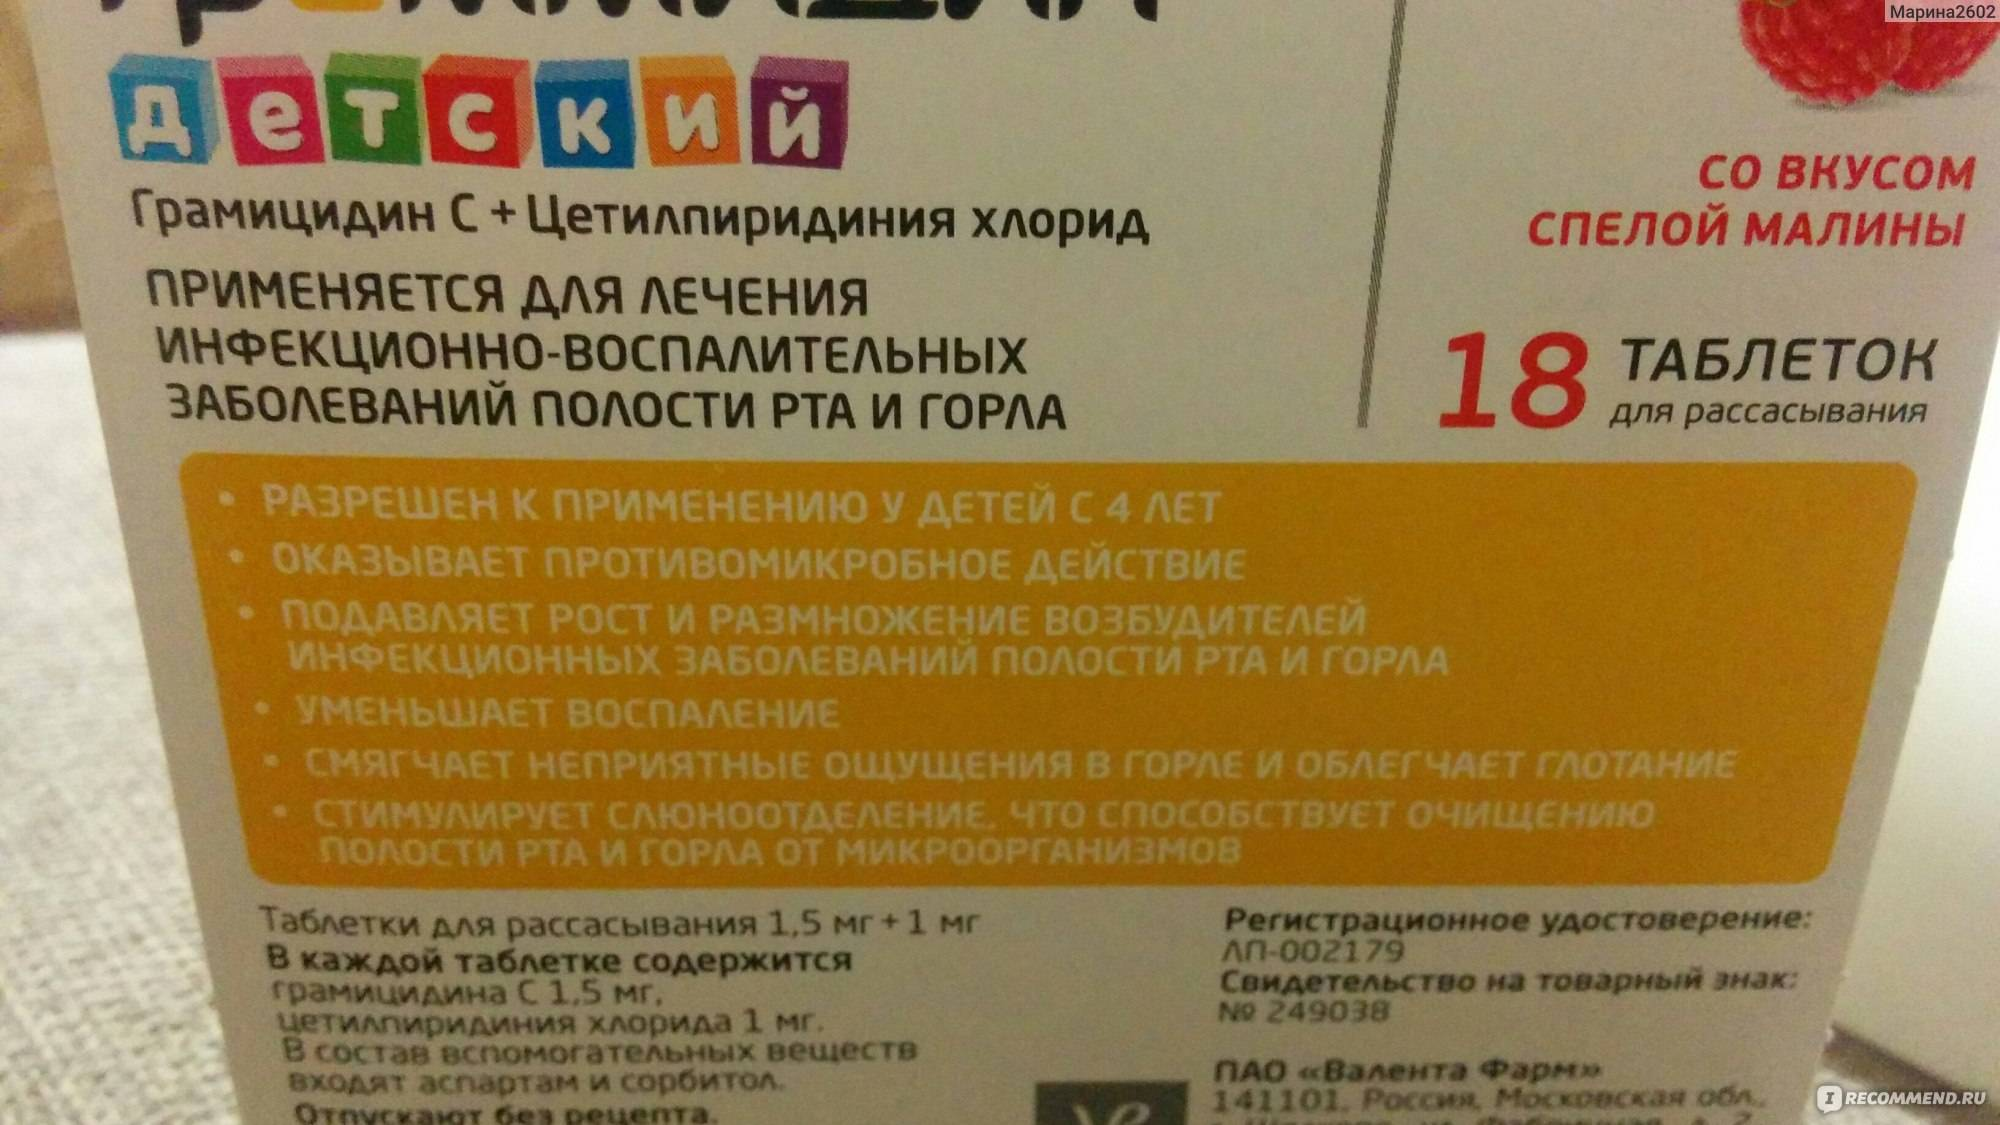 антибиотик от горла для детей